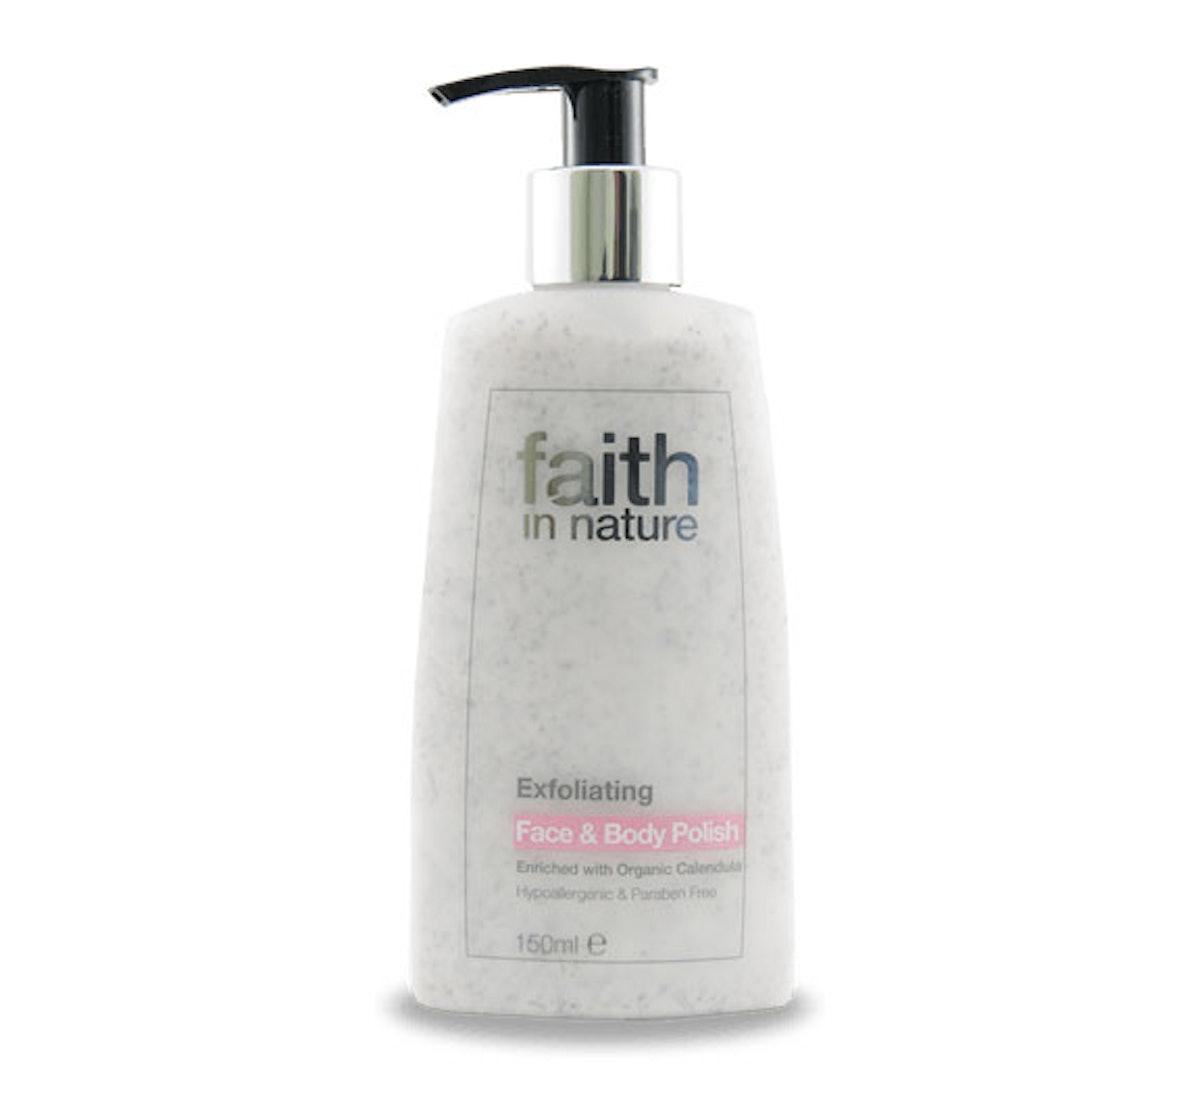 Faith in Nature Exfoliating Face & Body Polish